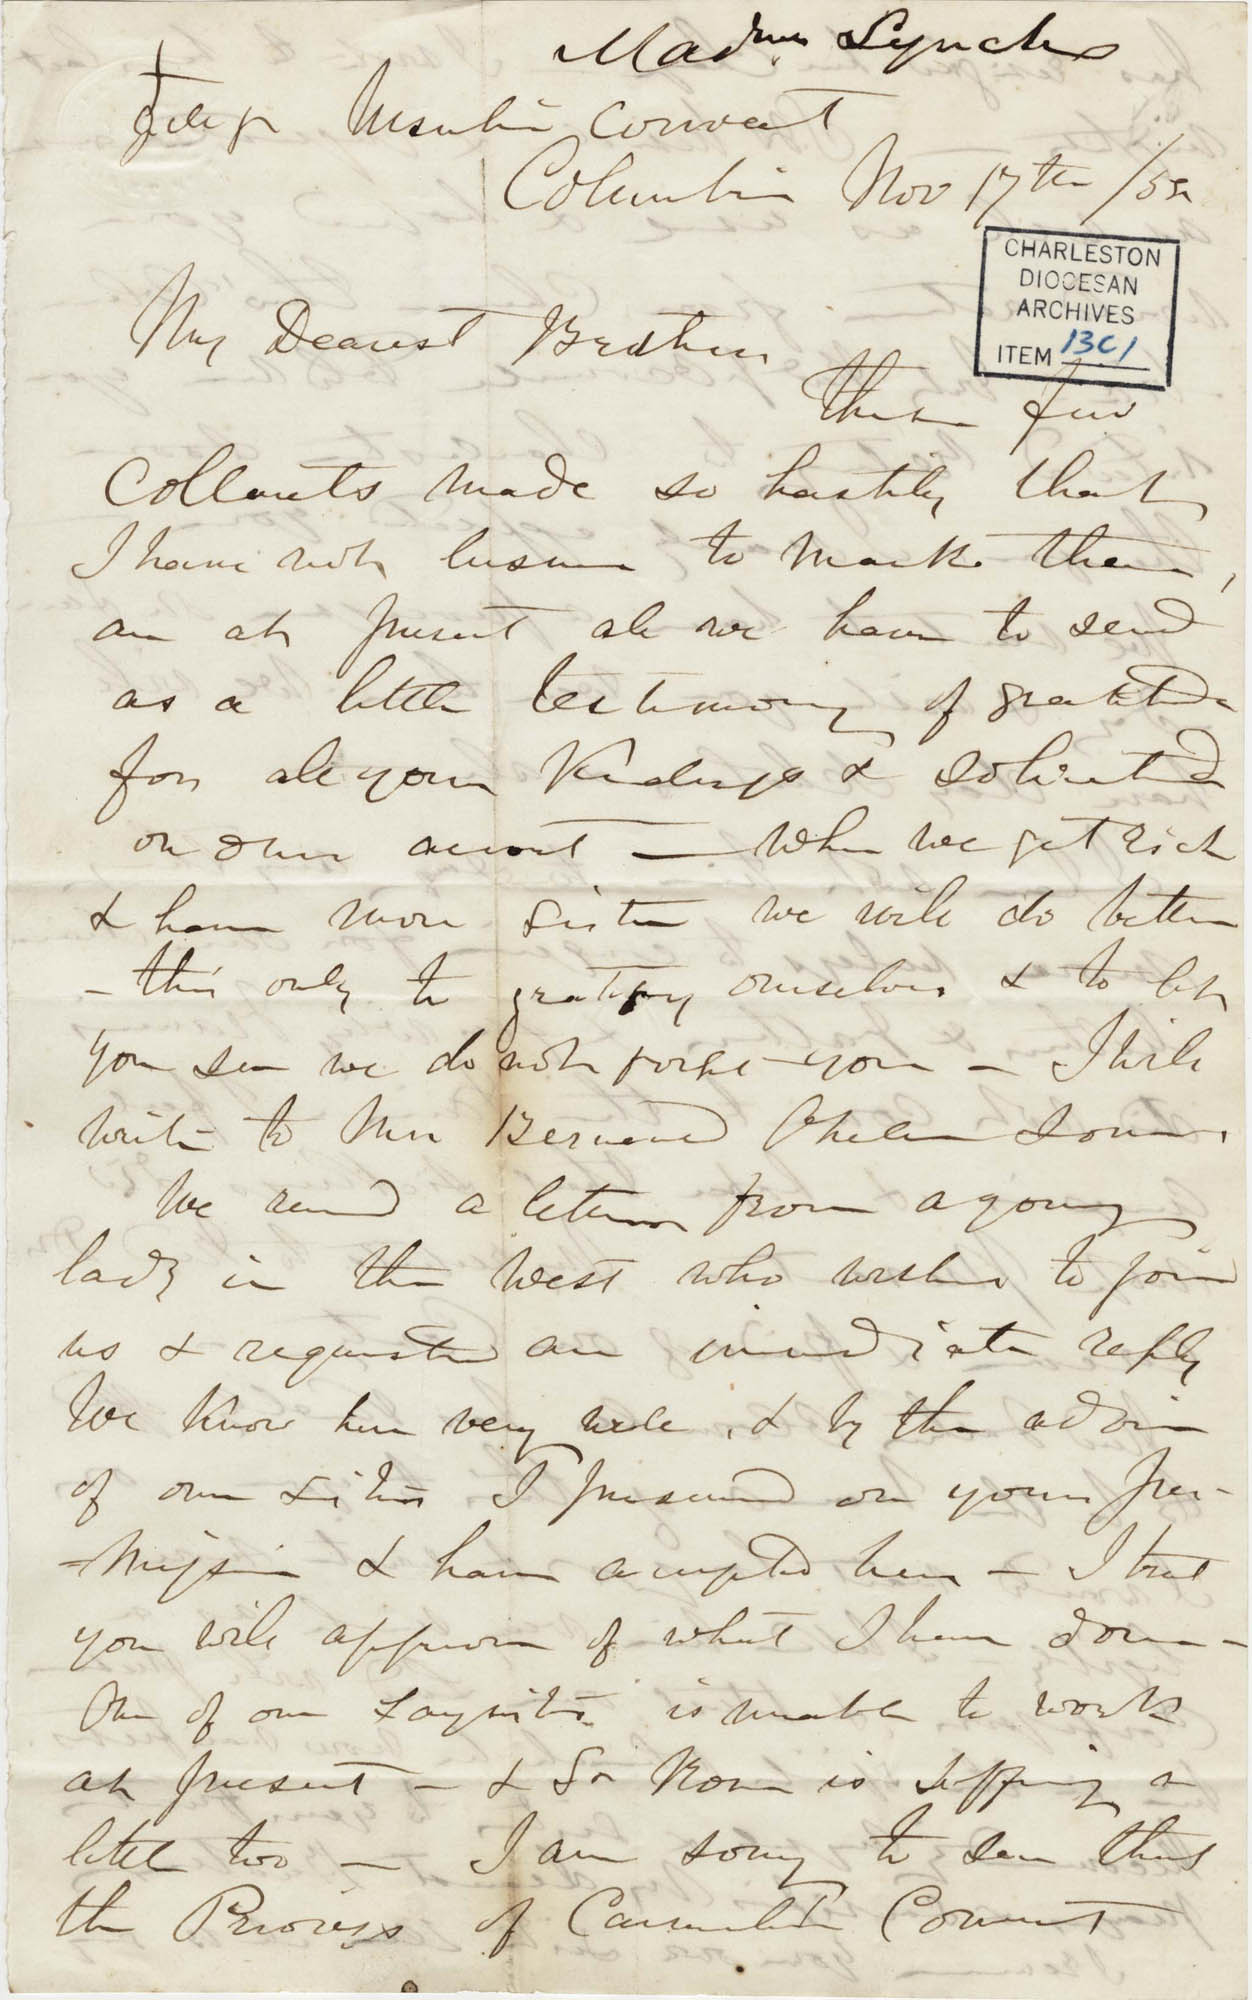 022. Madame Baptiste to Bp Patrick Lynch -- November 17, 1858